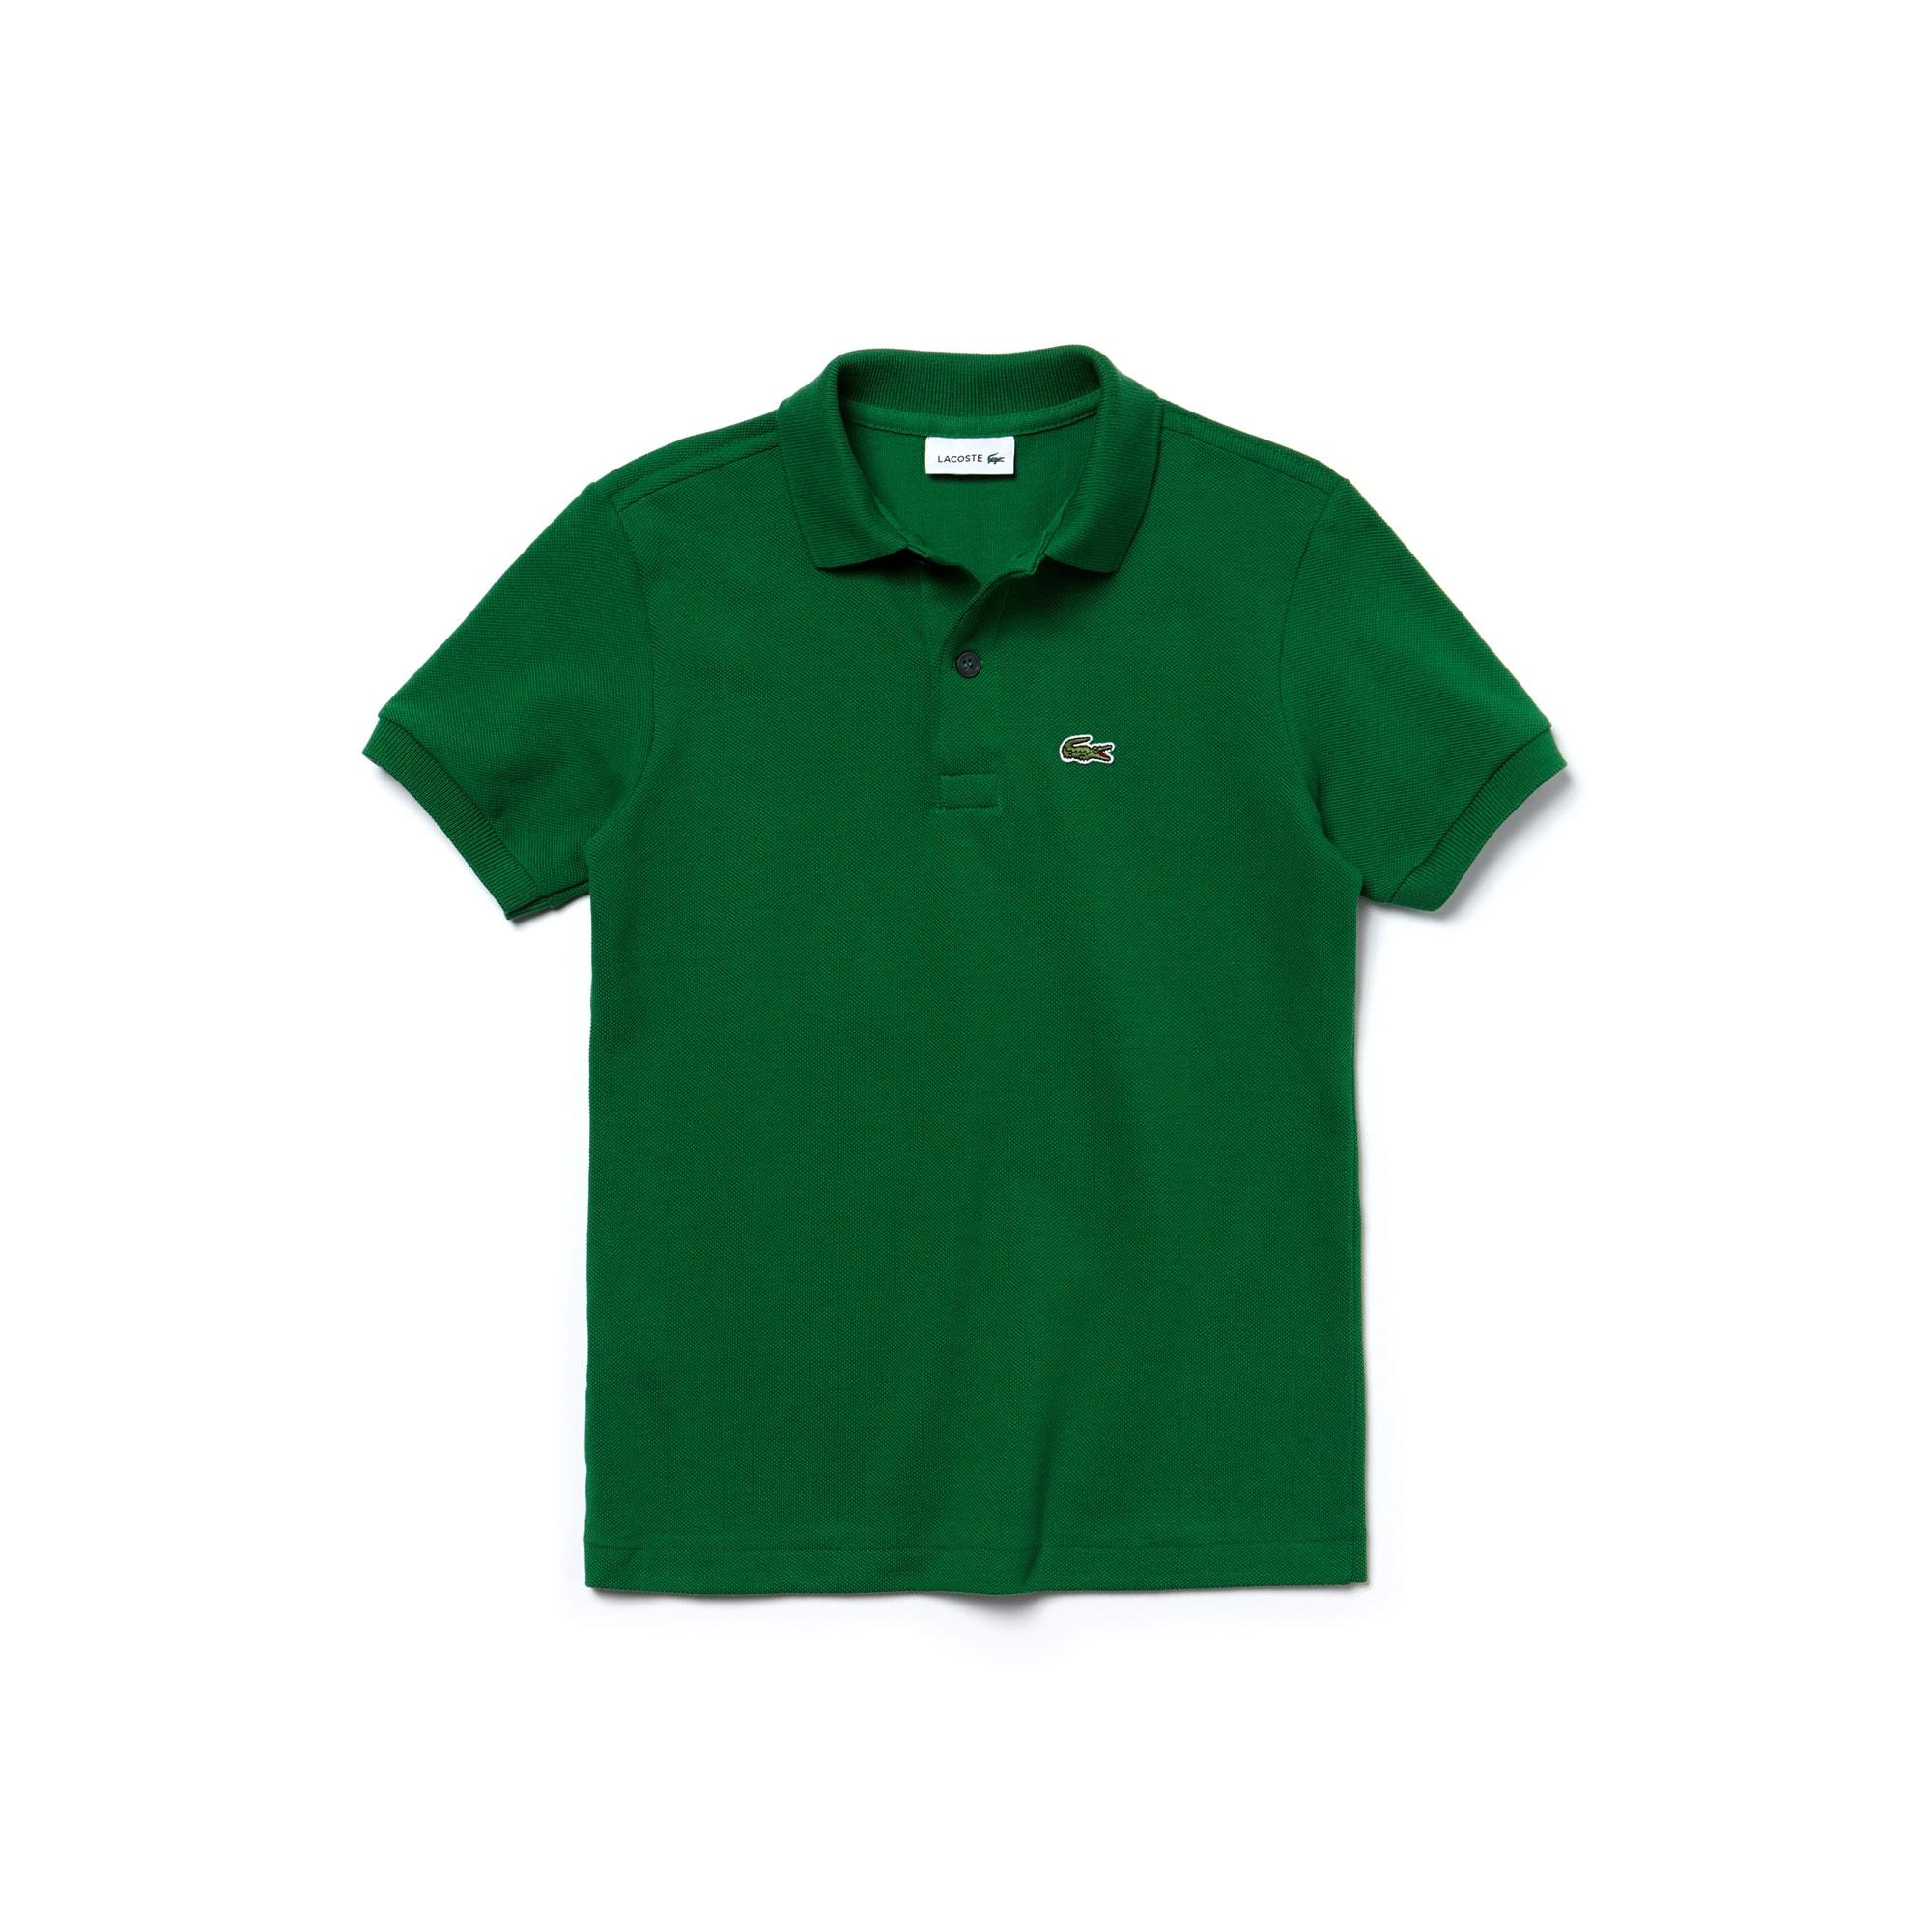 9b693efdca Clothing & Shoe collection | Boys Fashion | LACOSTE